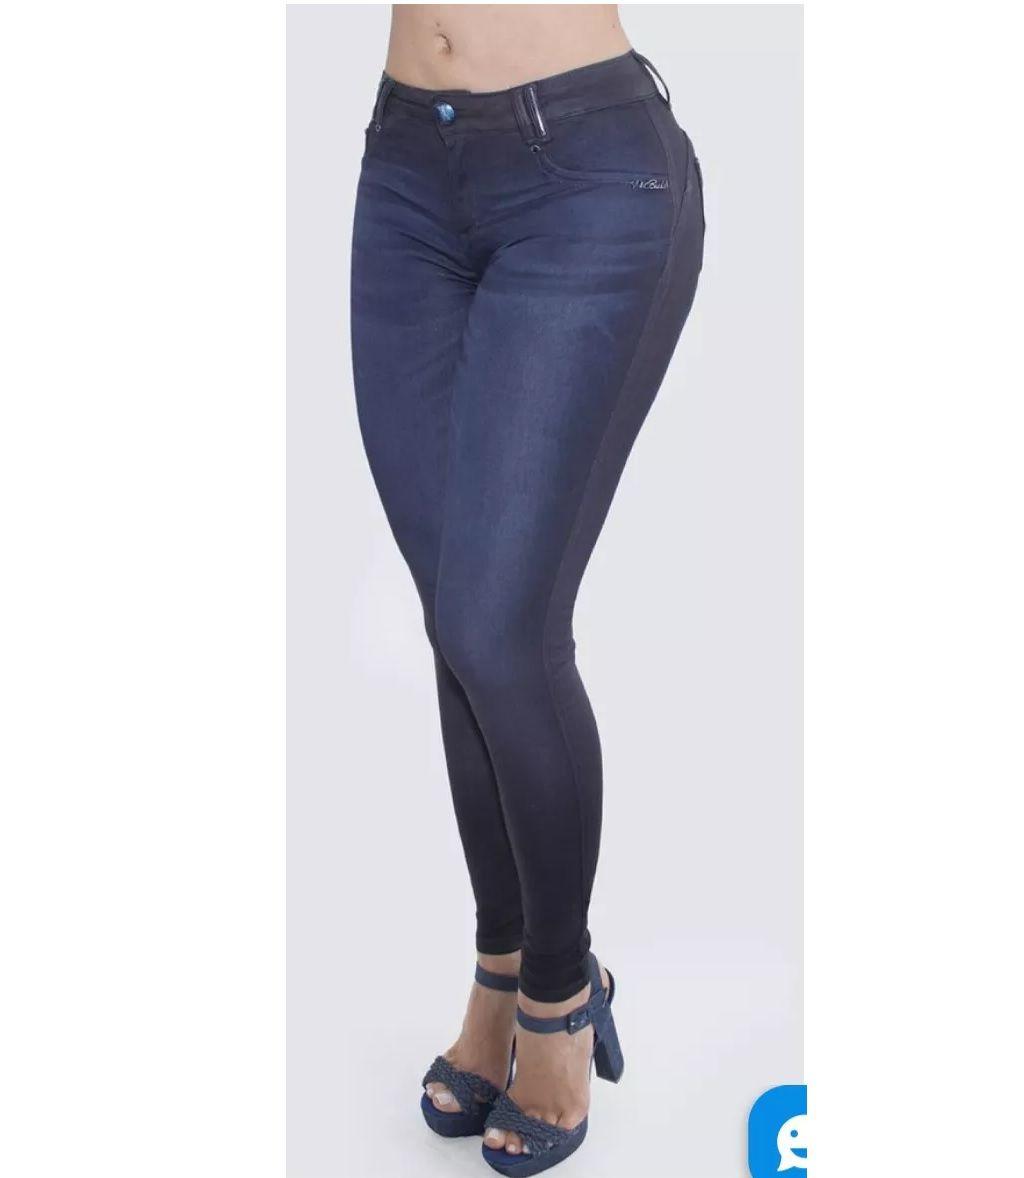 Calça Jeans Feminina PitBull Cigarrete Pit Bull 26851